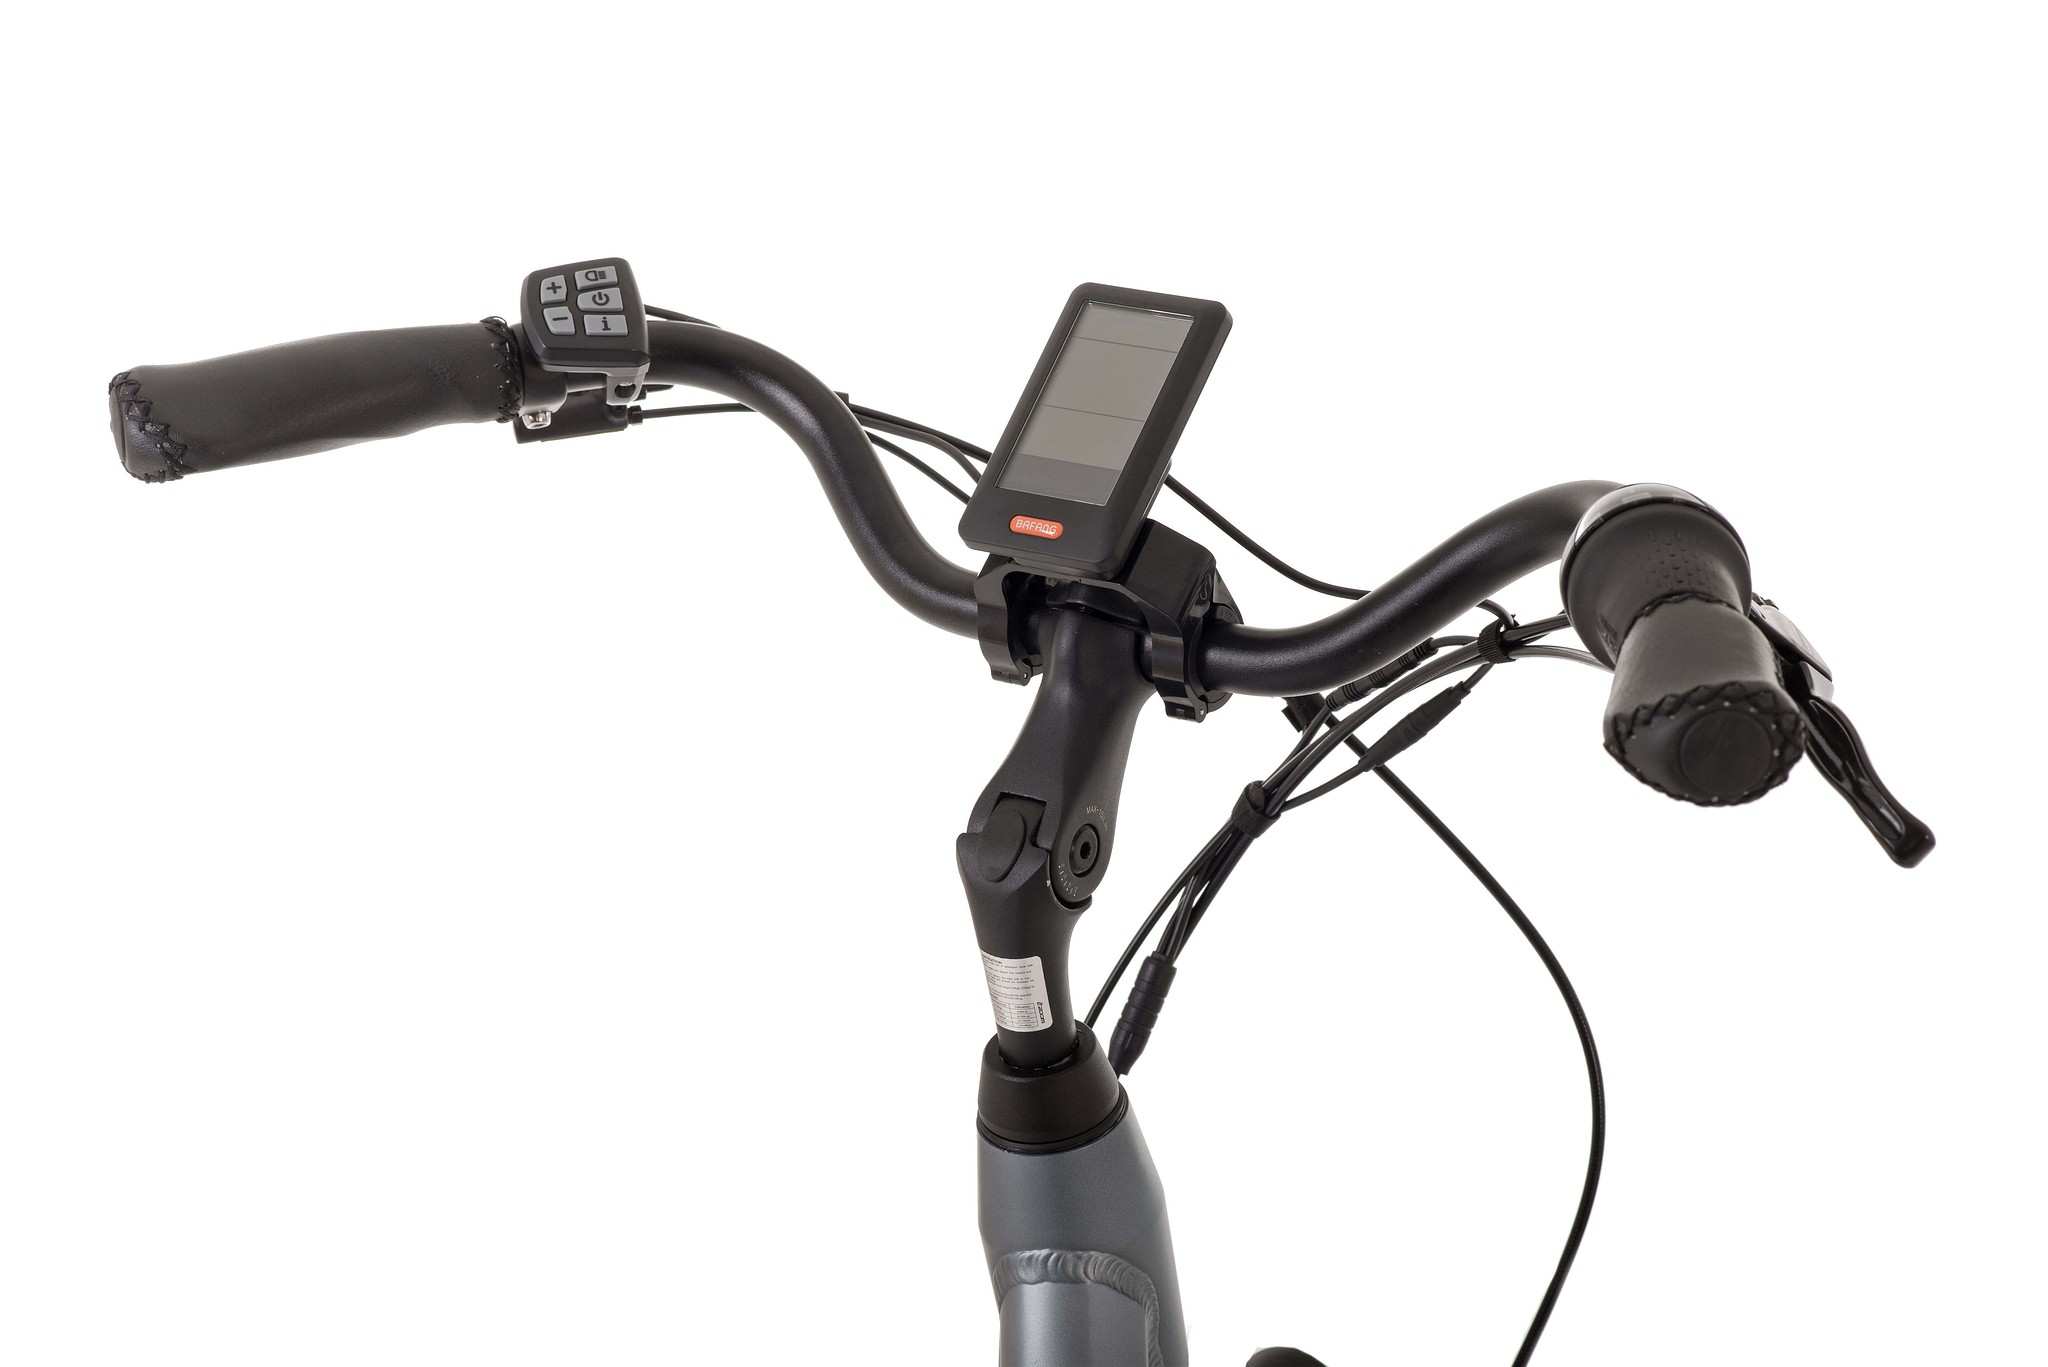 Bimas Elektrische fiets E-City 7.1 heren cool grijs 57cm 450 Watt Grijs